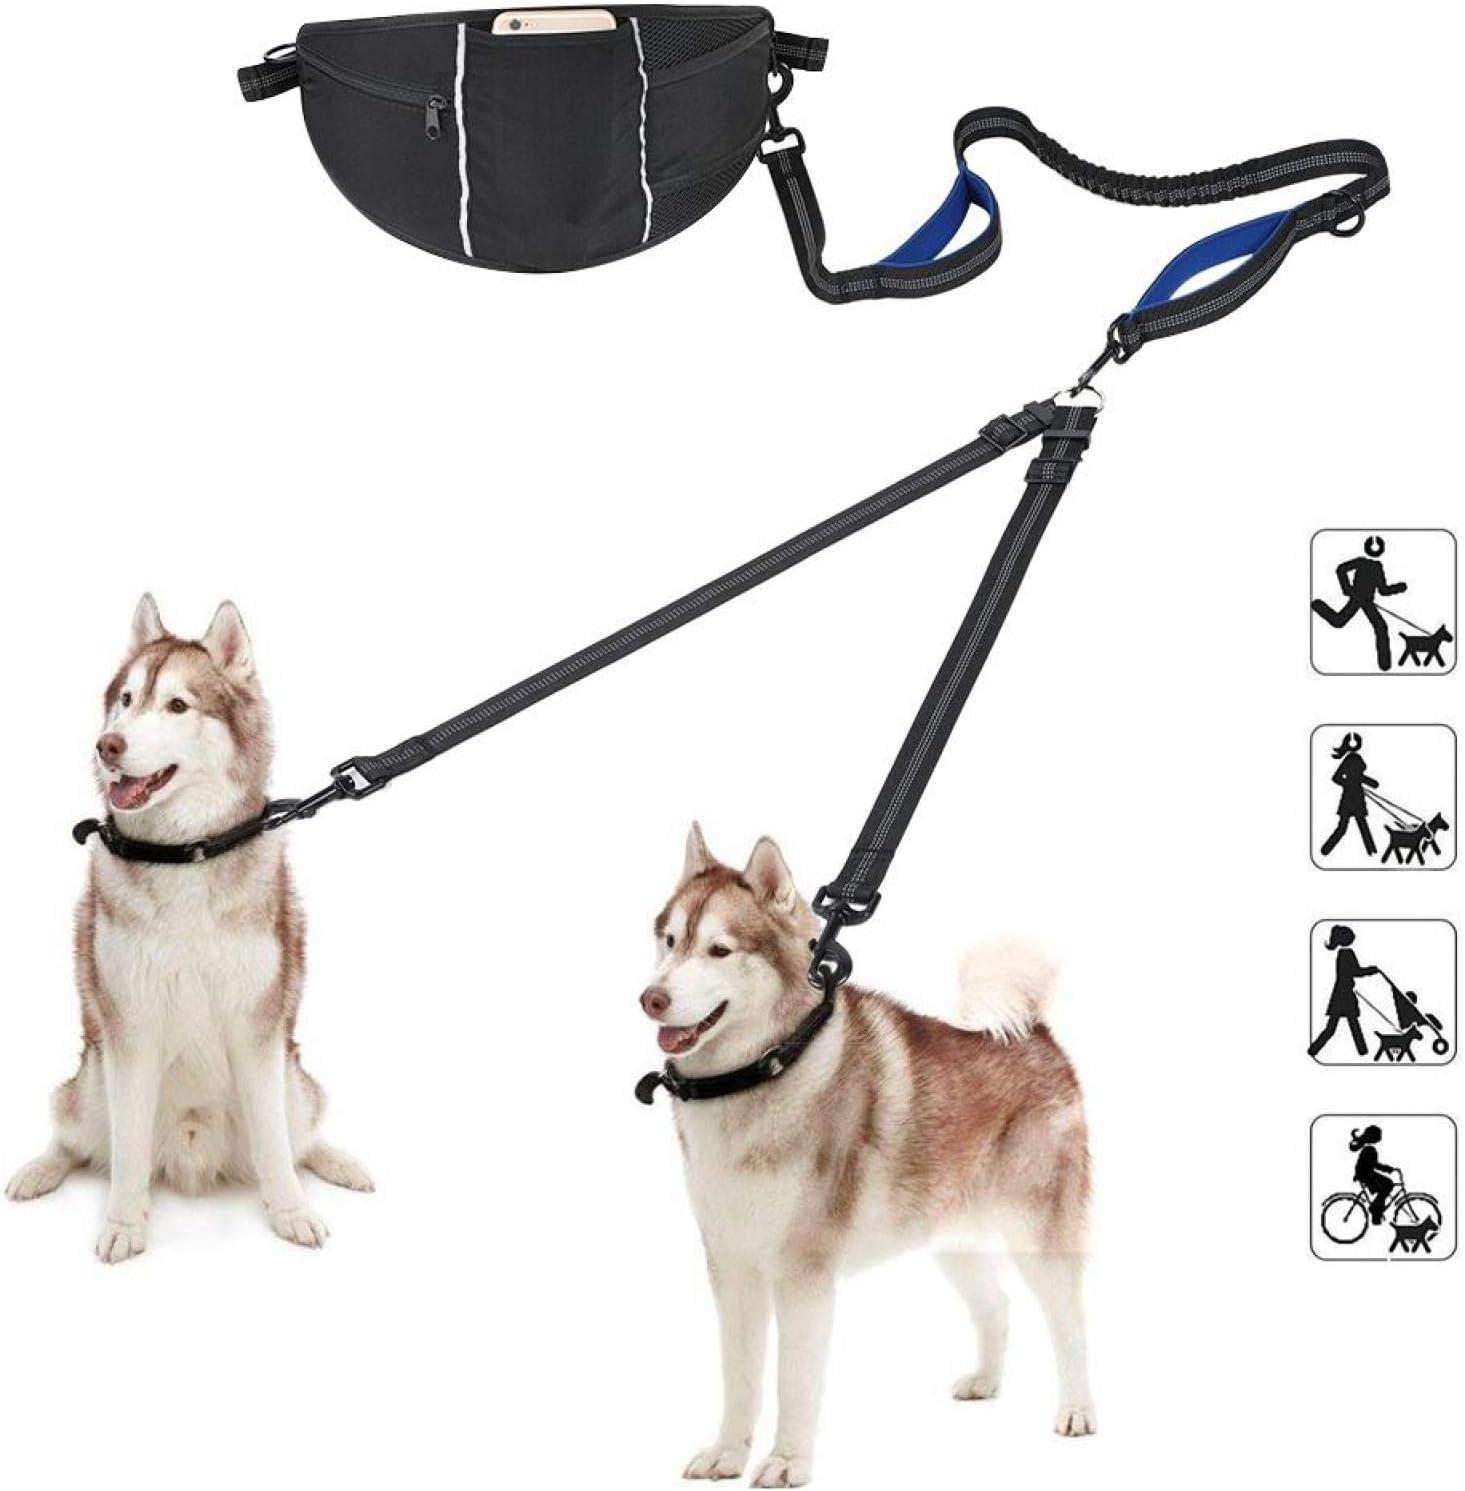 GLOGLOW Hands Outlet SALE Free Dog 5 ☆ popular Leash Belt Walking Double Reflective